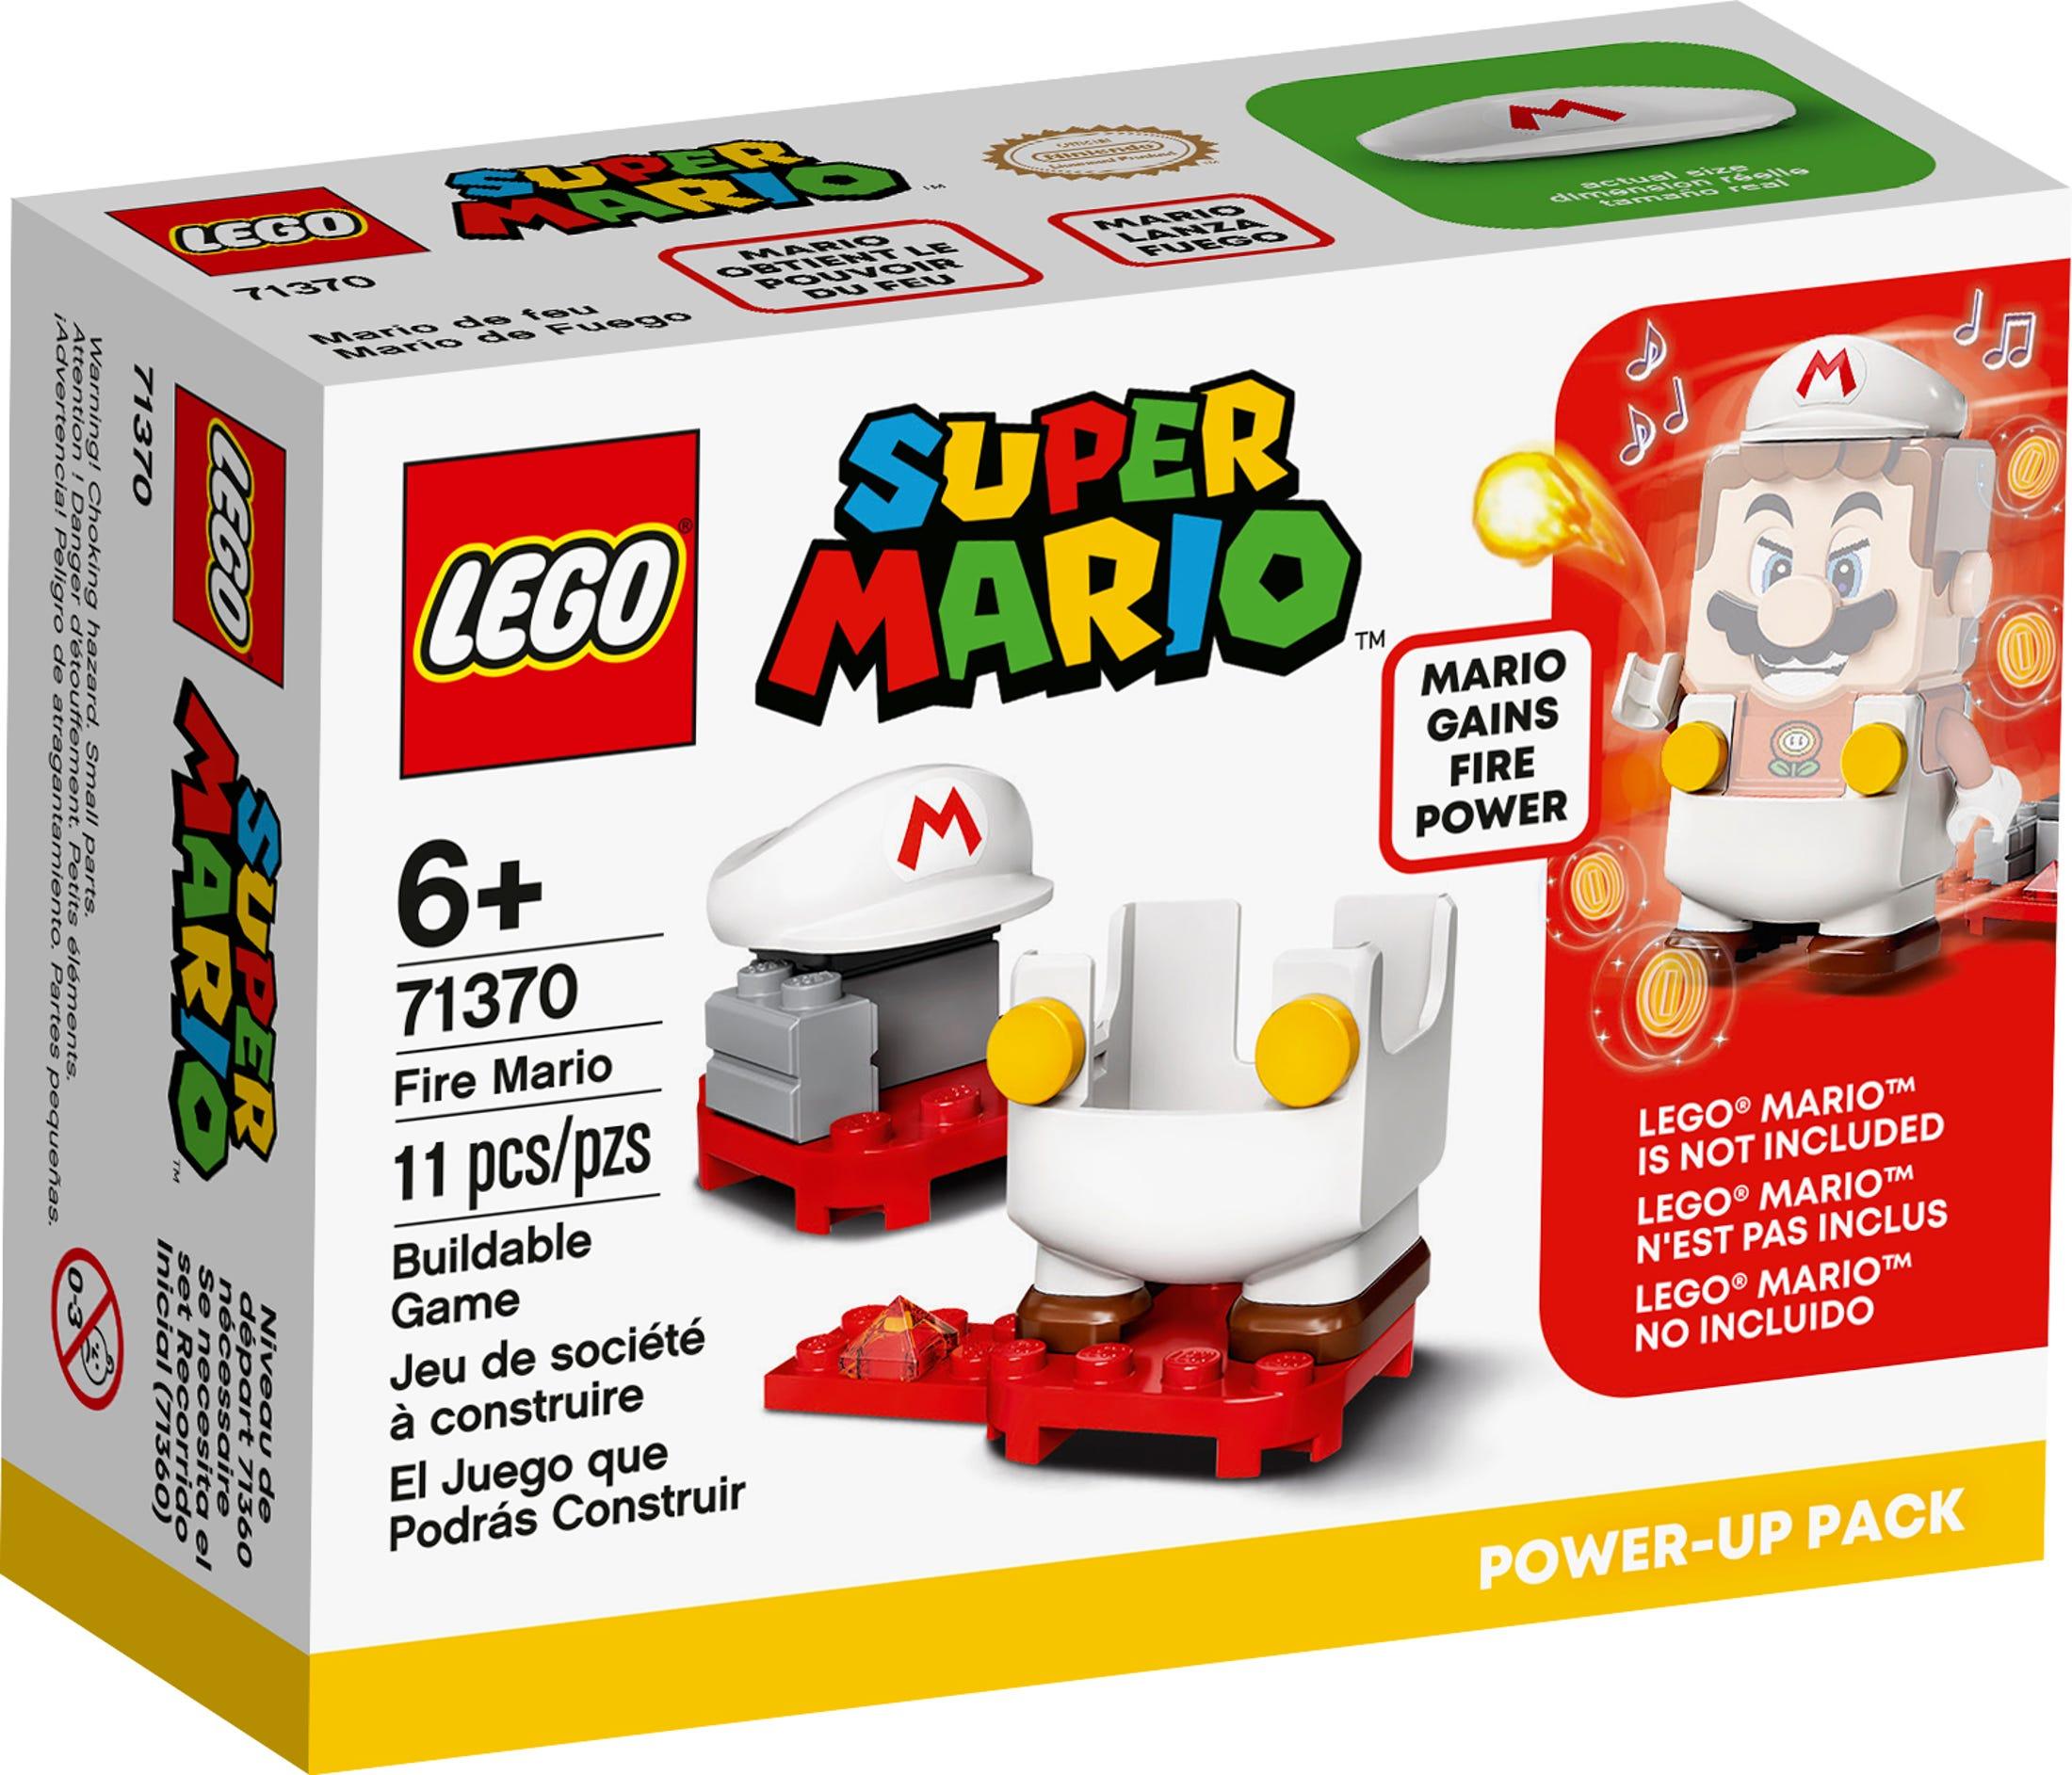 LEGO 71370 Fire Mario Power-Up Pack - Super Mario